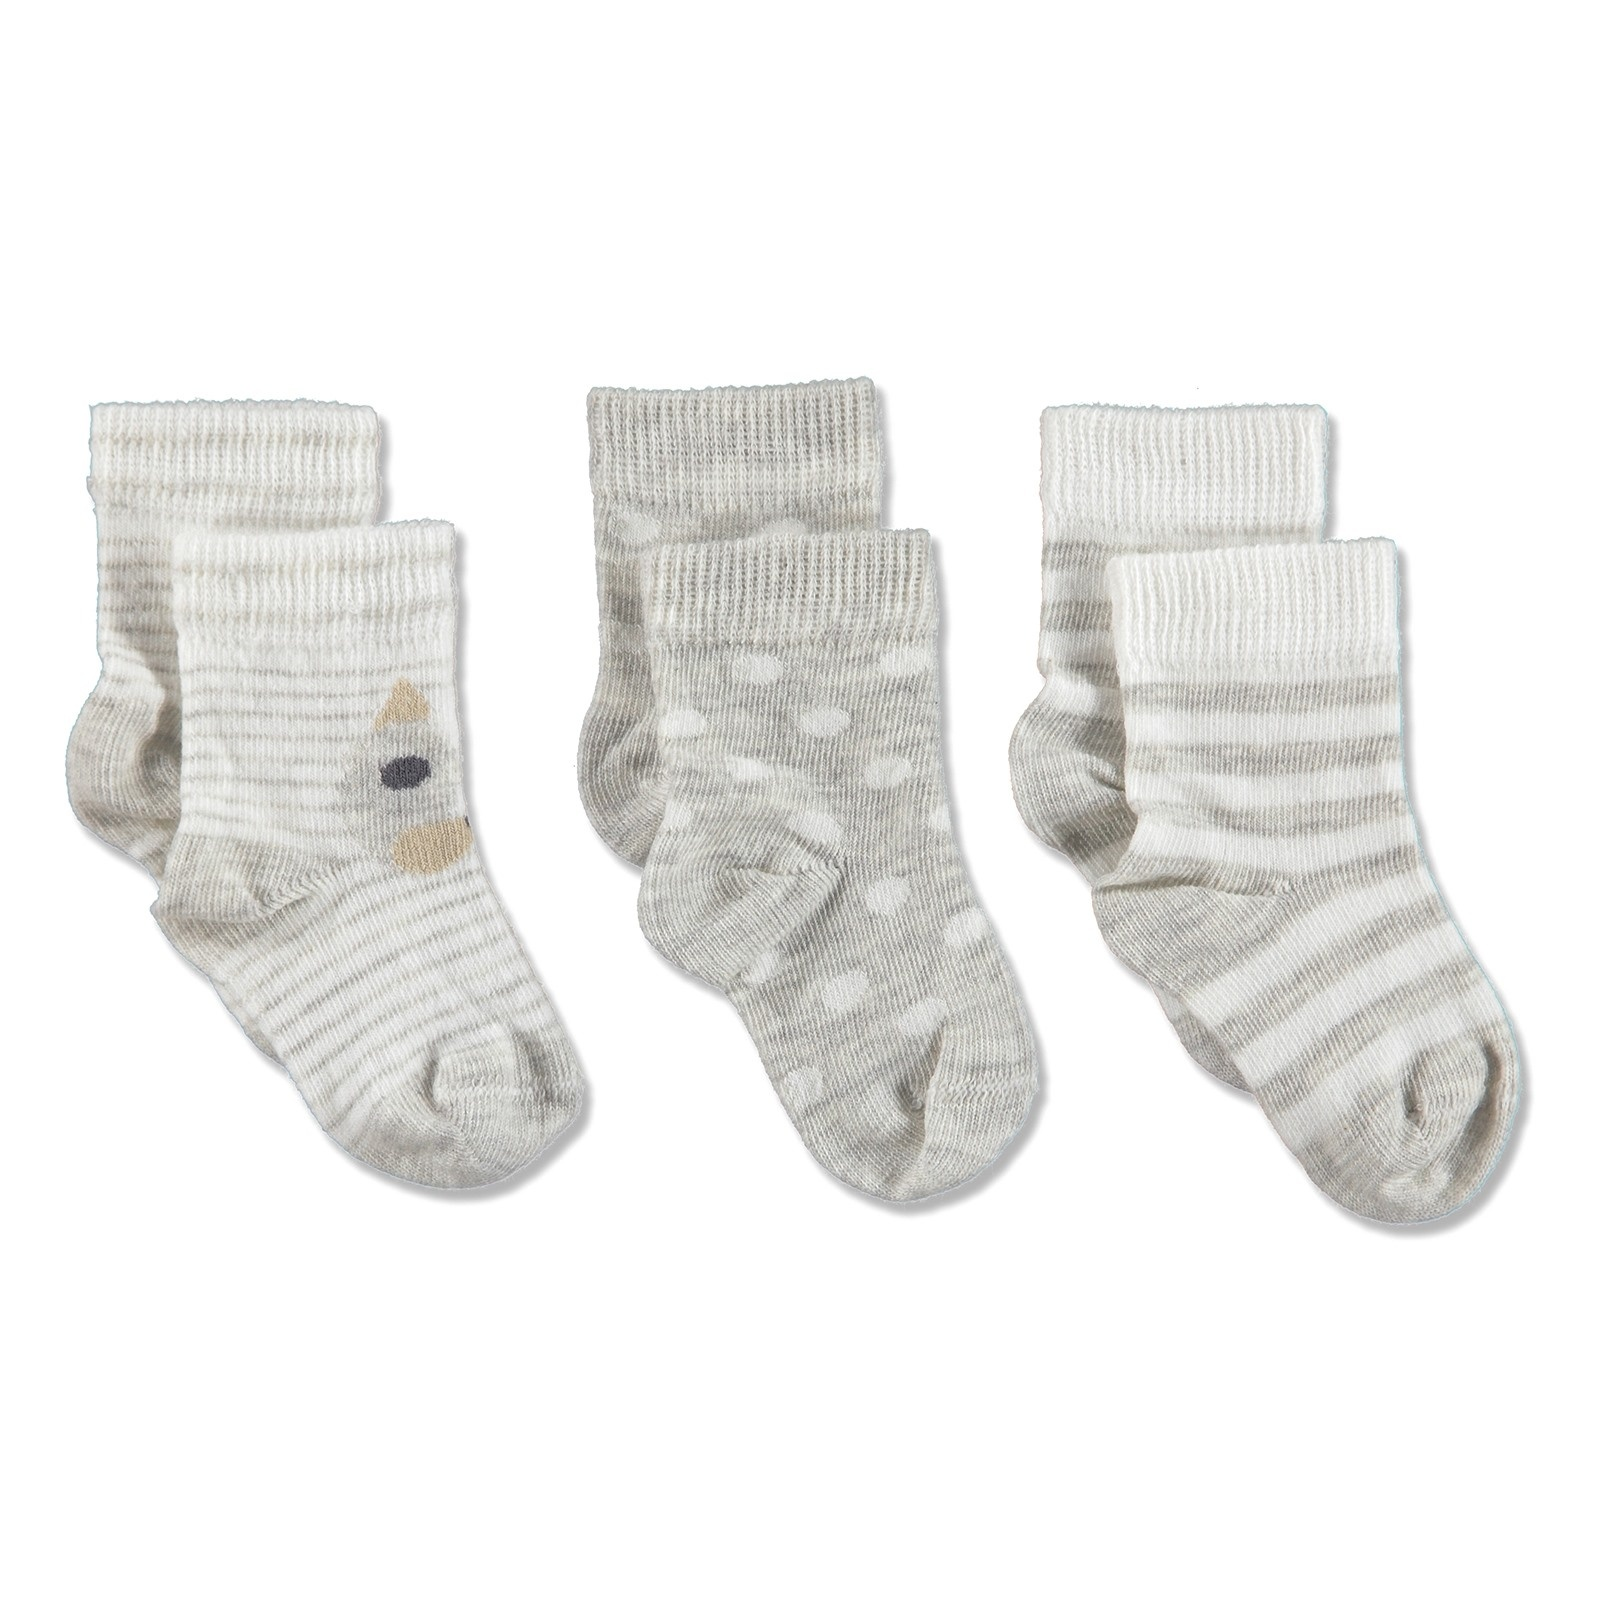 Ebebek Aziz Bebe Cotton Baby Socks 3 Pcs